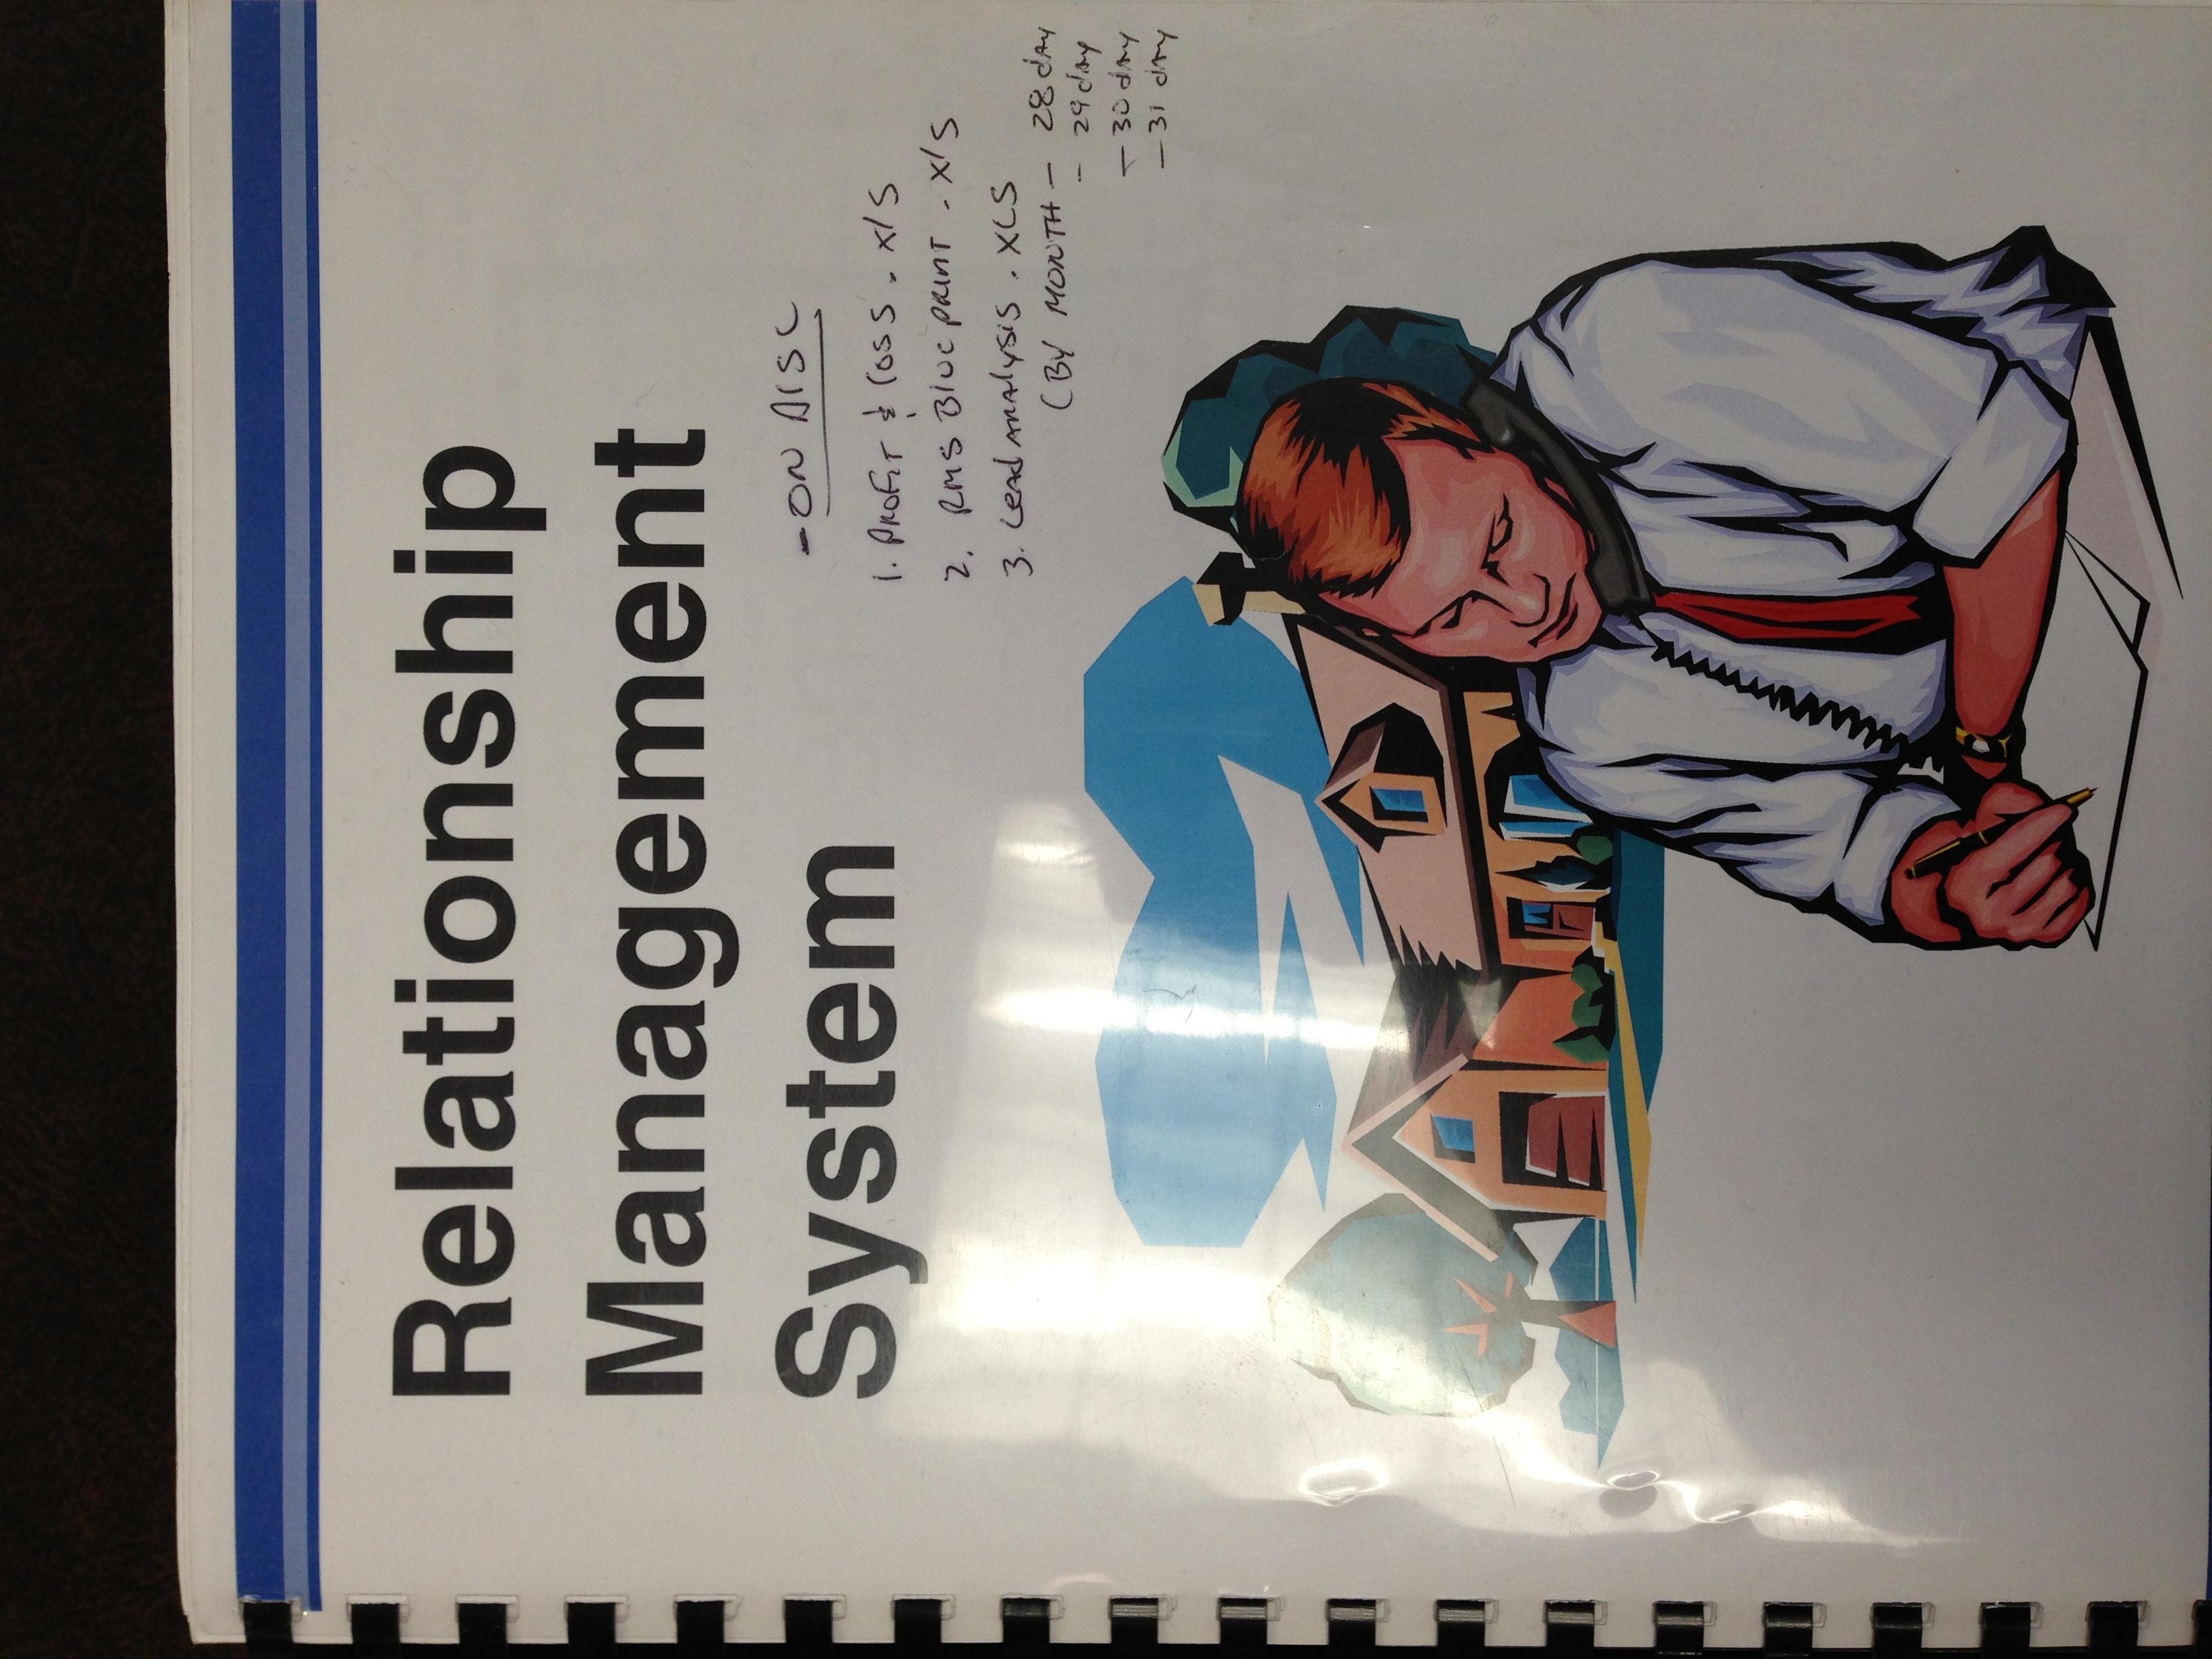 Relationship Management System for Automotive Sales Professionals